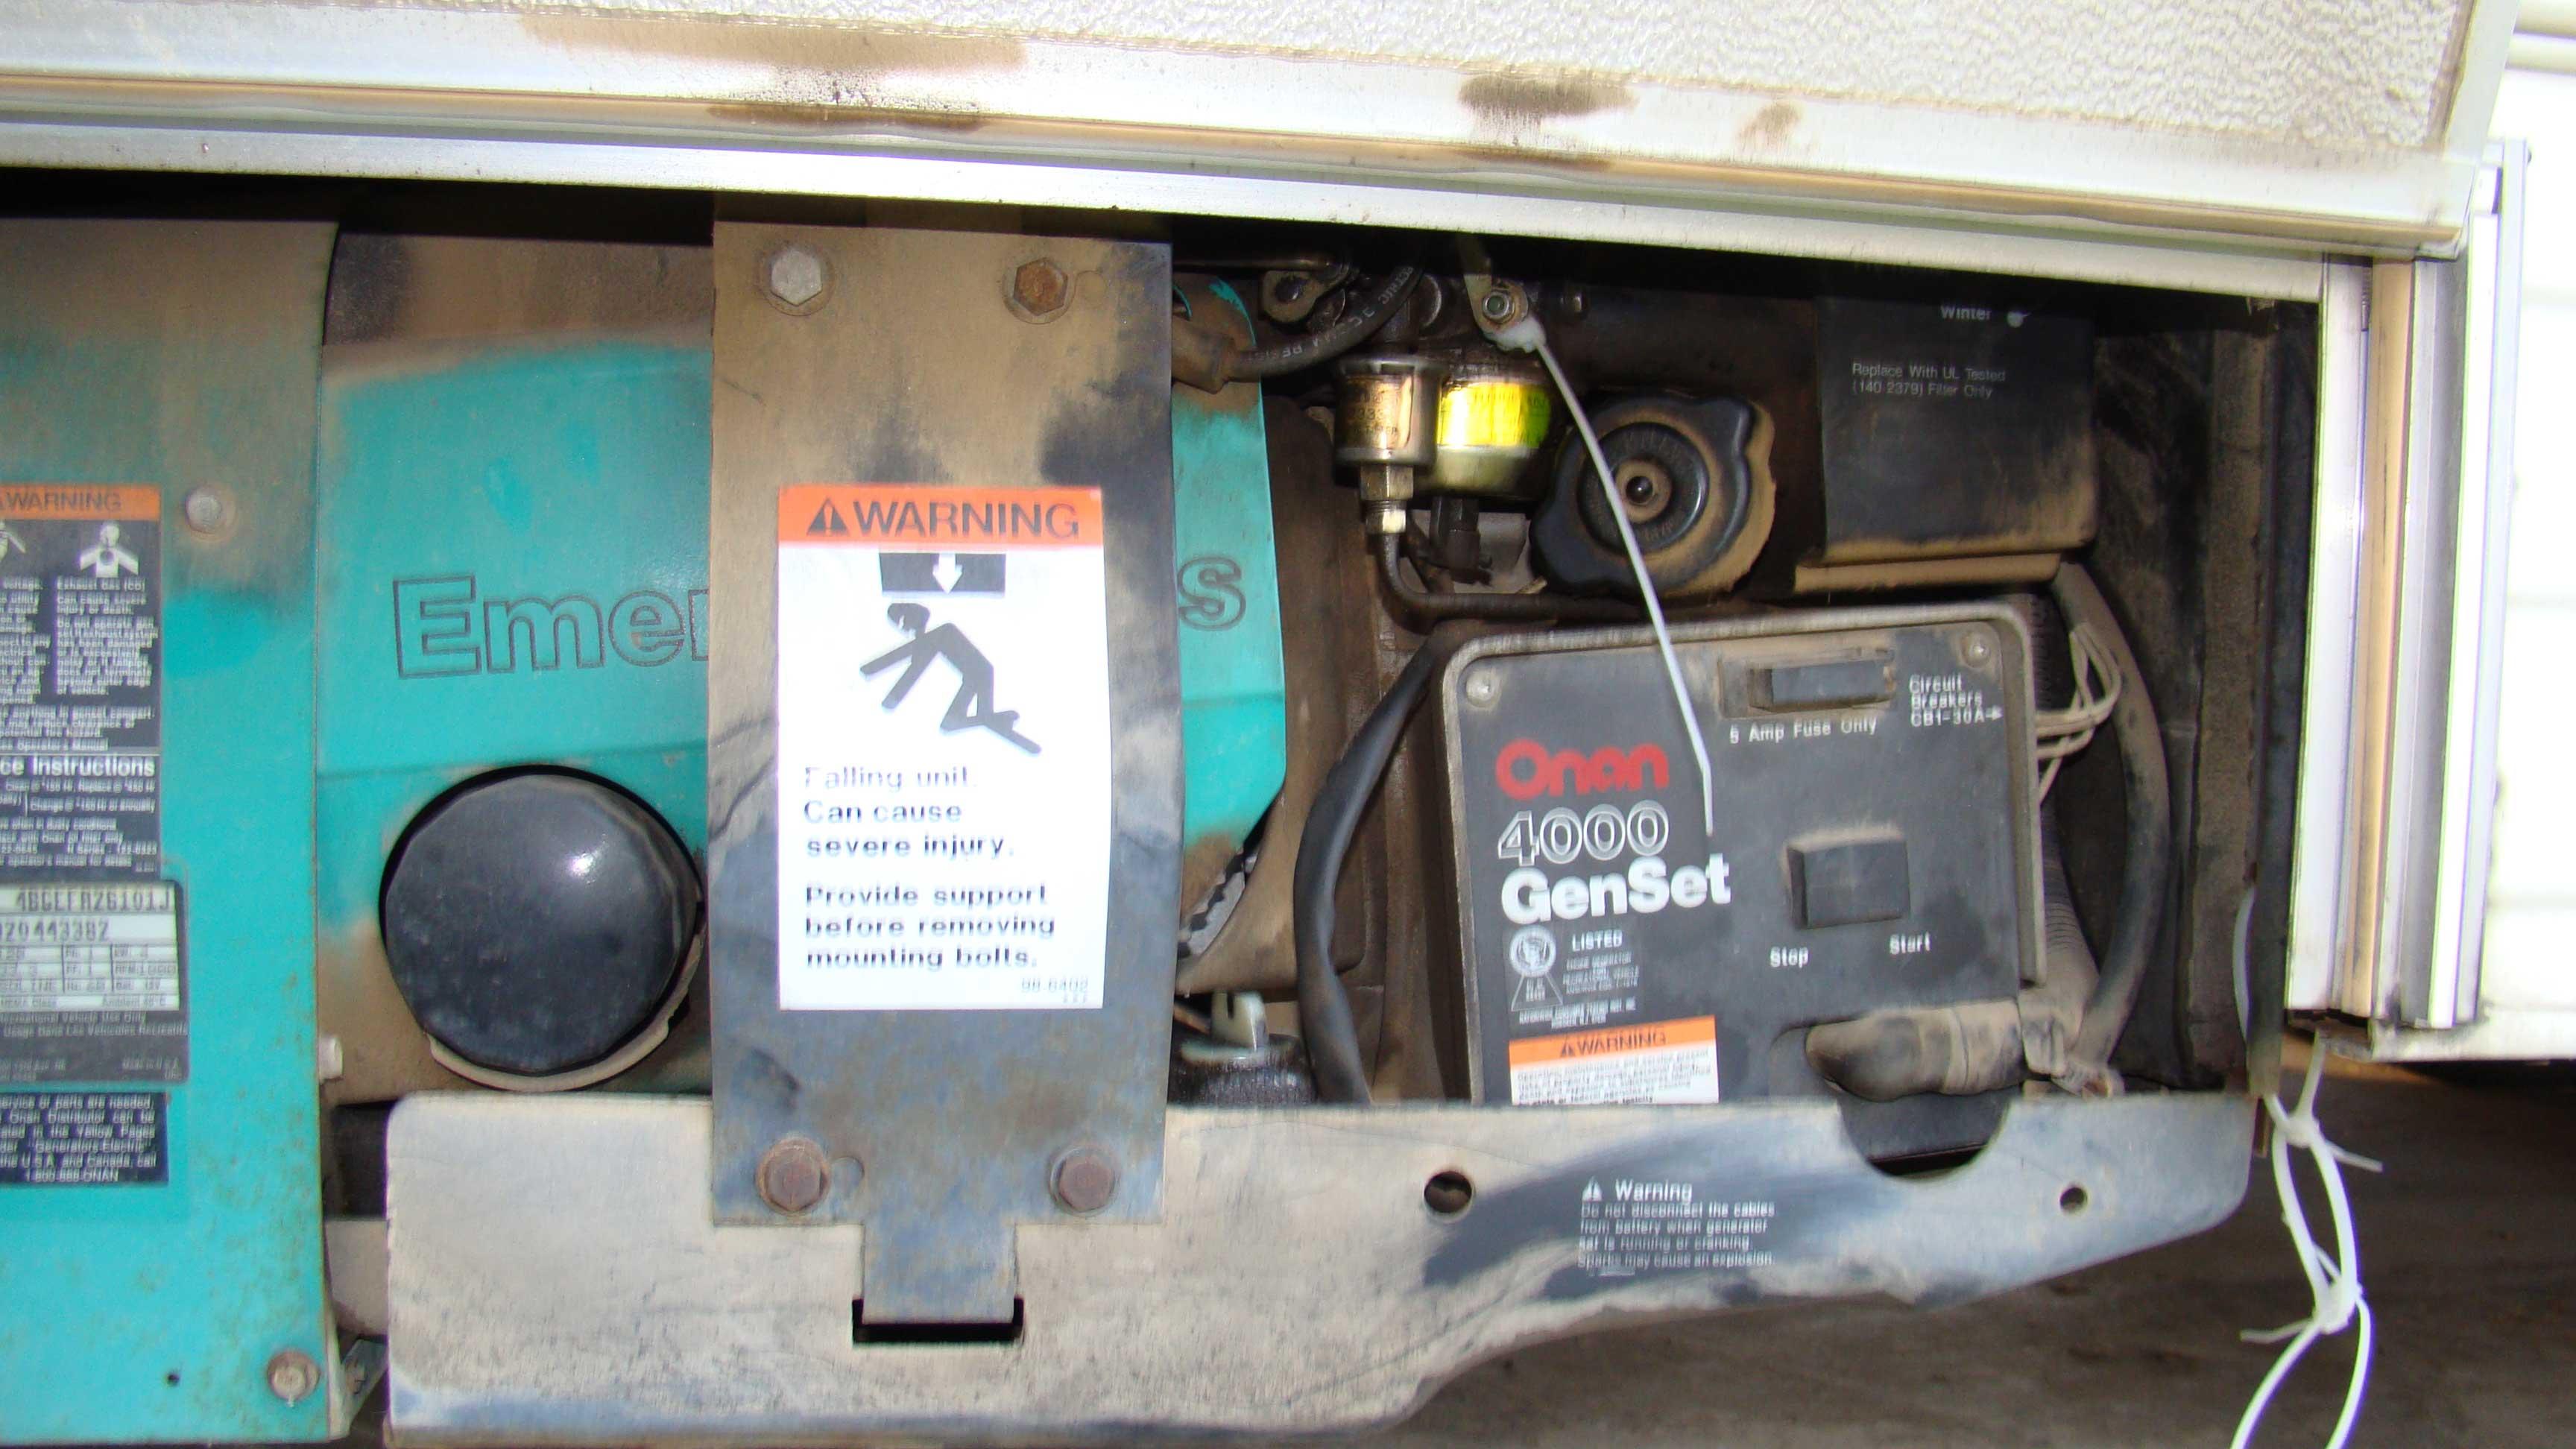 335v2 92 Fleetwood Onan Generator Want Change Air Filter also  likewise 7 5 Onan Generator Fuel Filter moreover Onan Marquis Gold 5500 Oil Change likewise Onan. on onan 4000 generator oil filter location